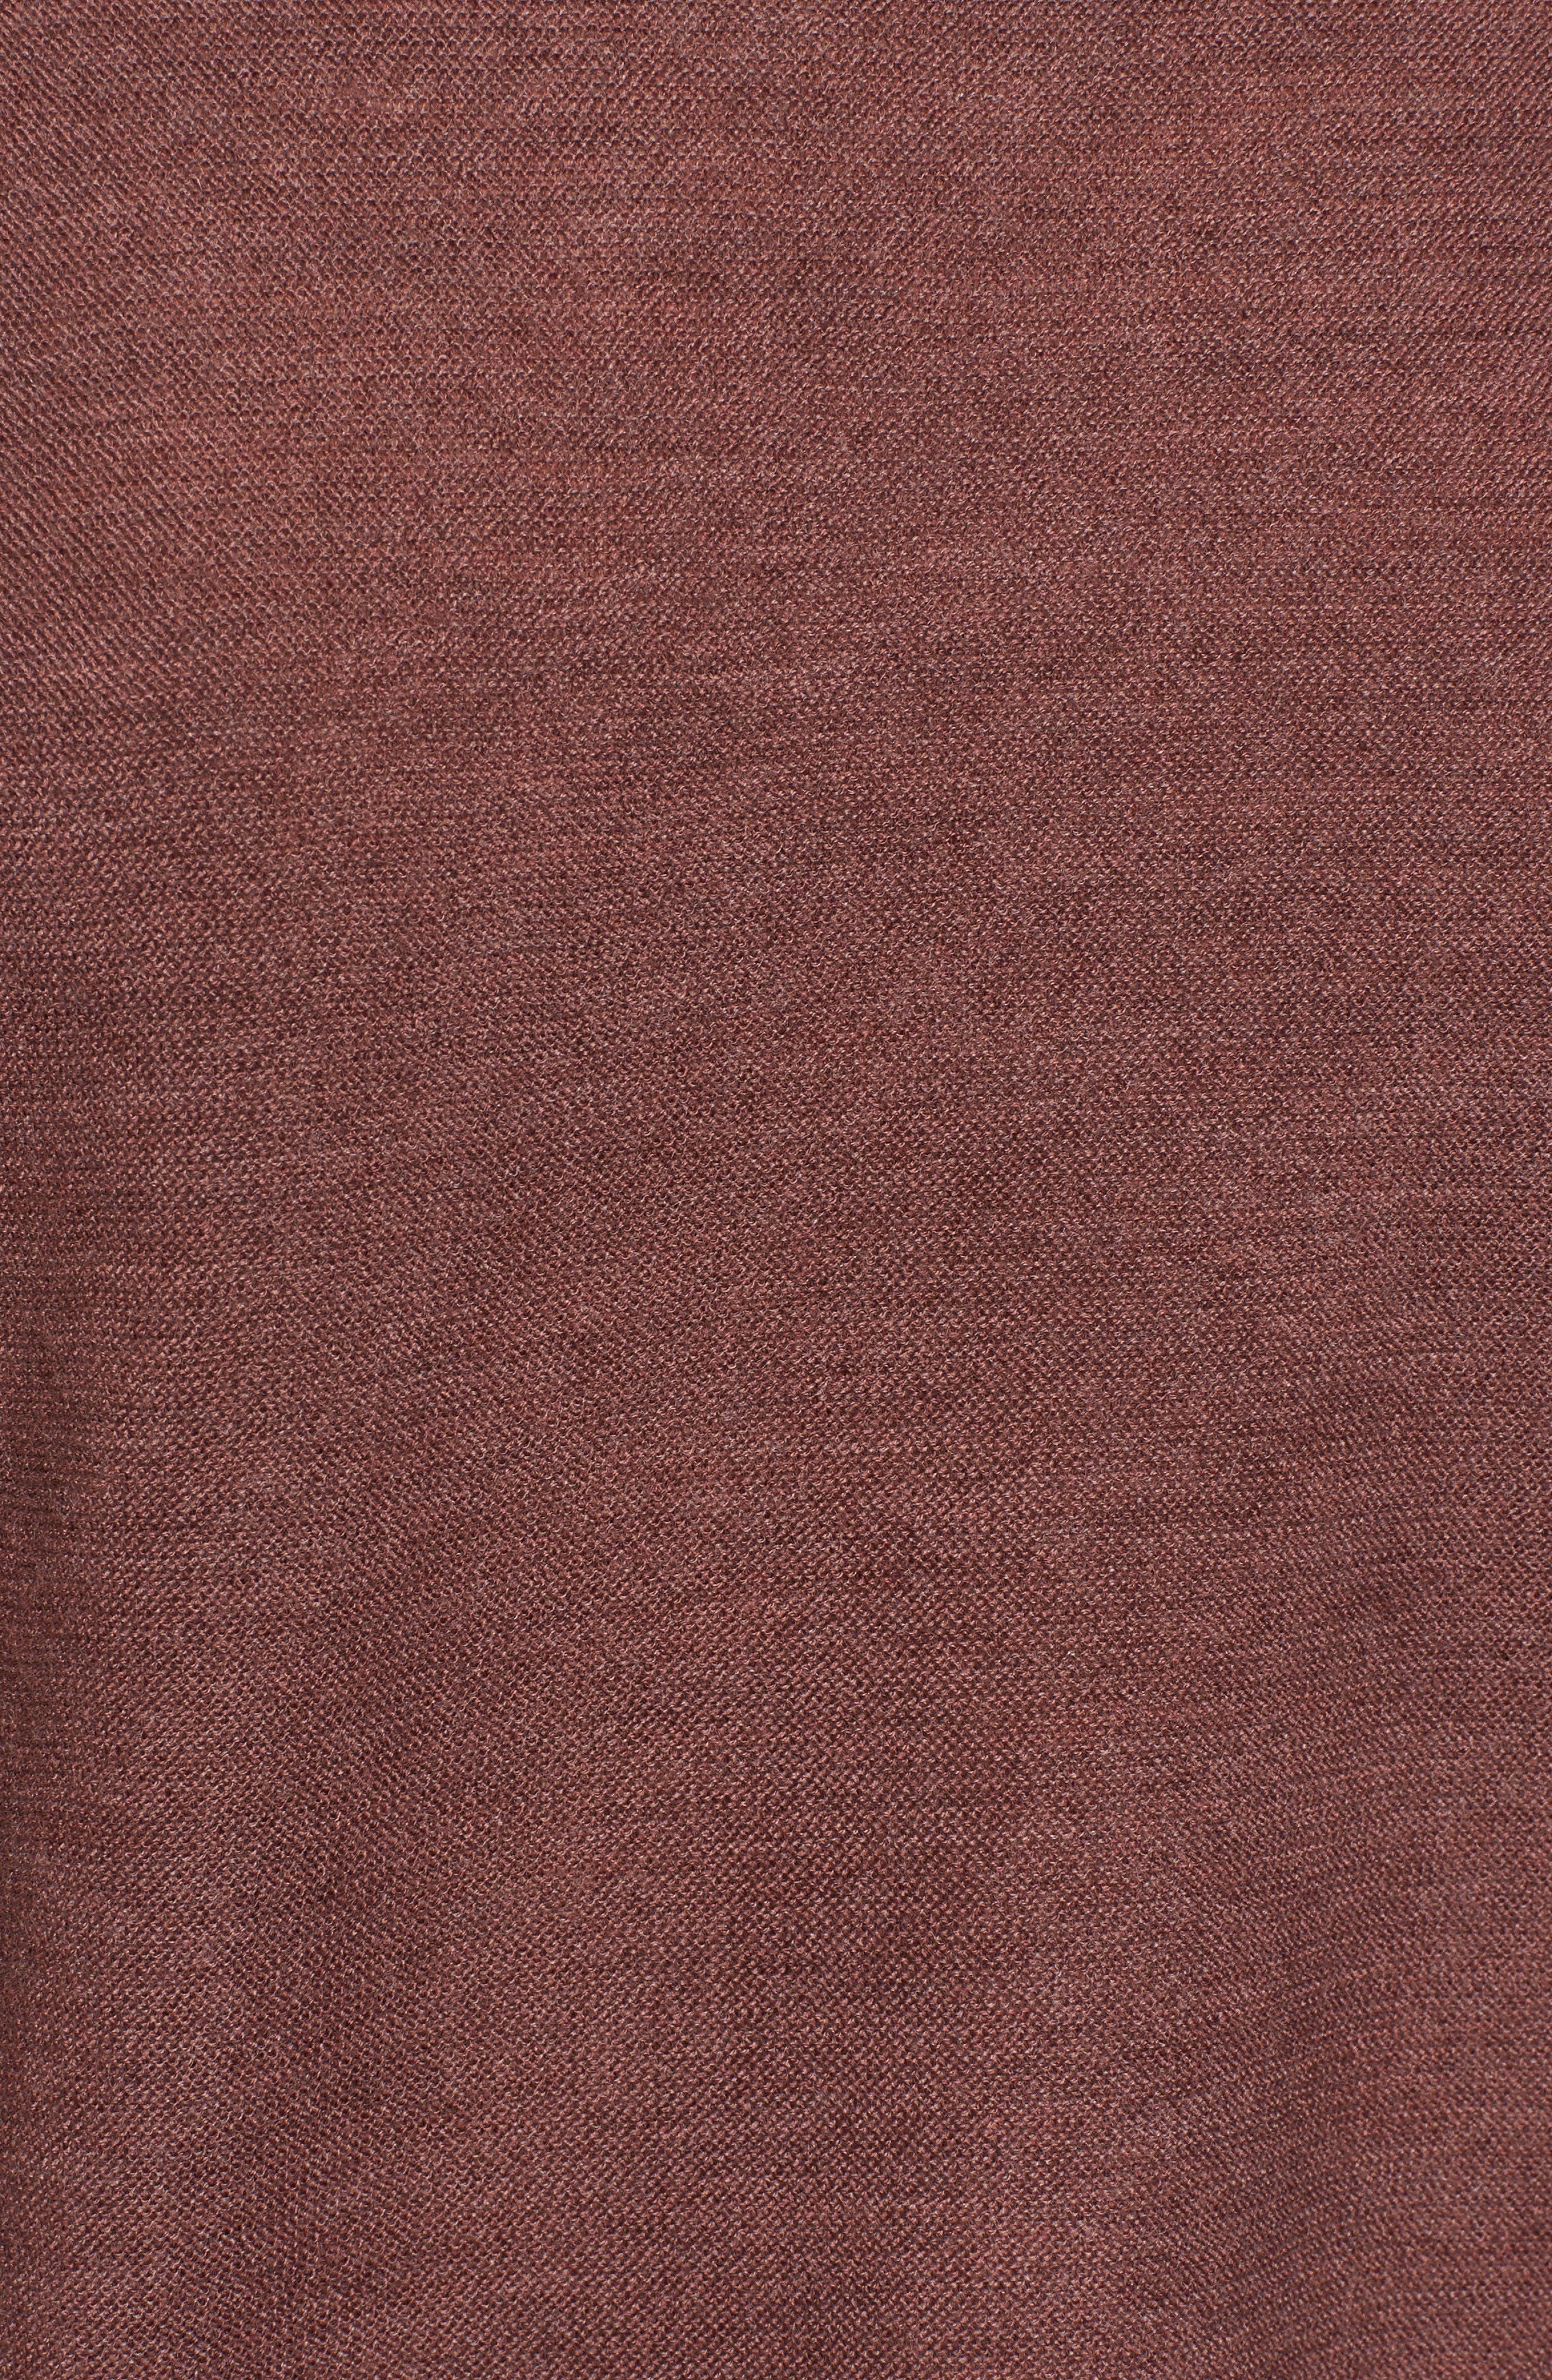 Mix Stitch Merino Bateau Neck Sweater,                             Alternate thumbnail 5, color,                             Mahogany